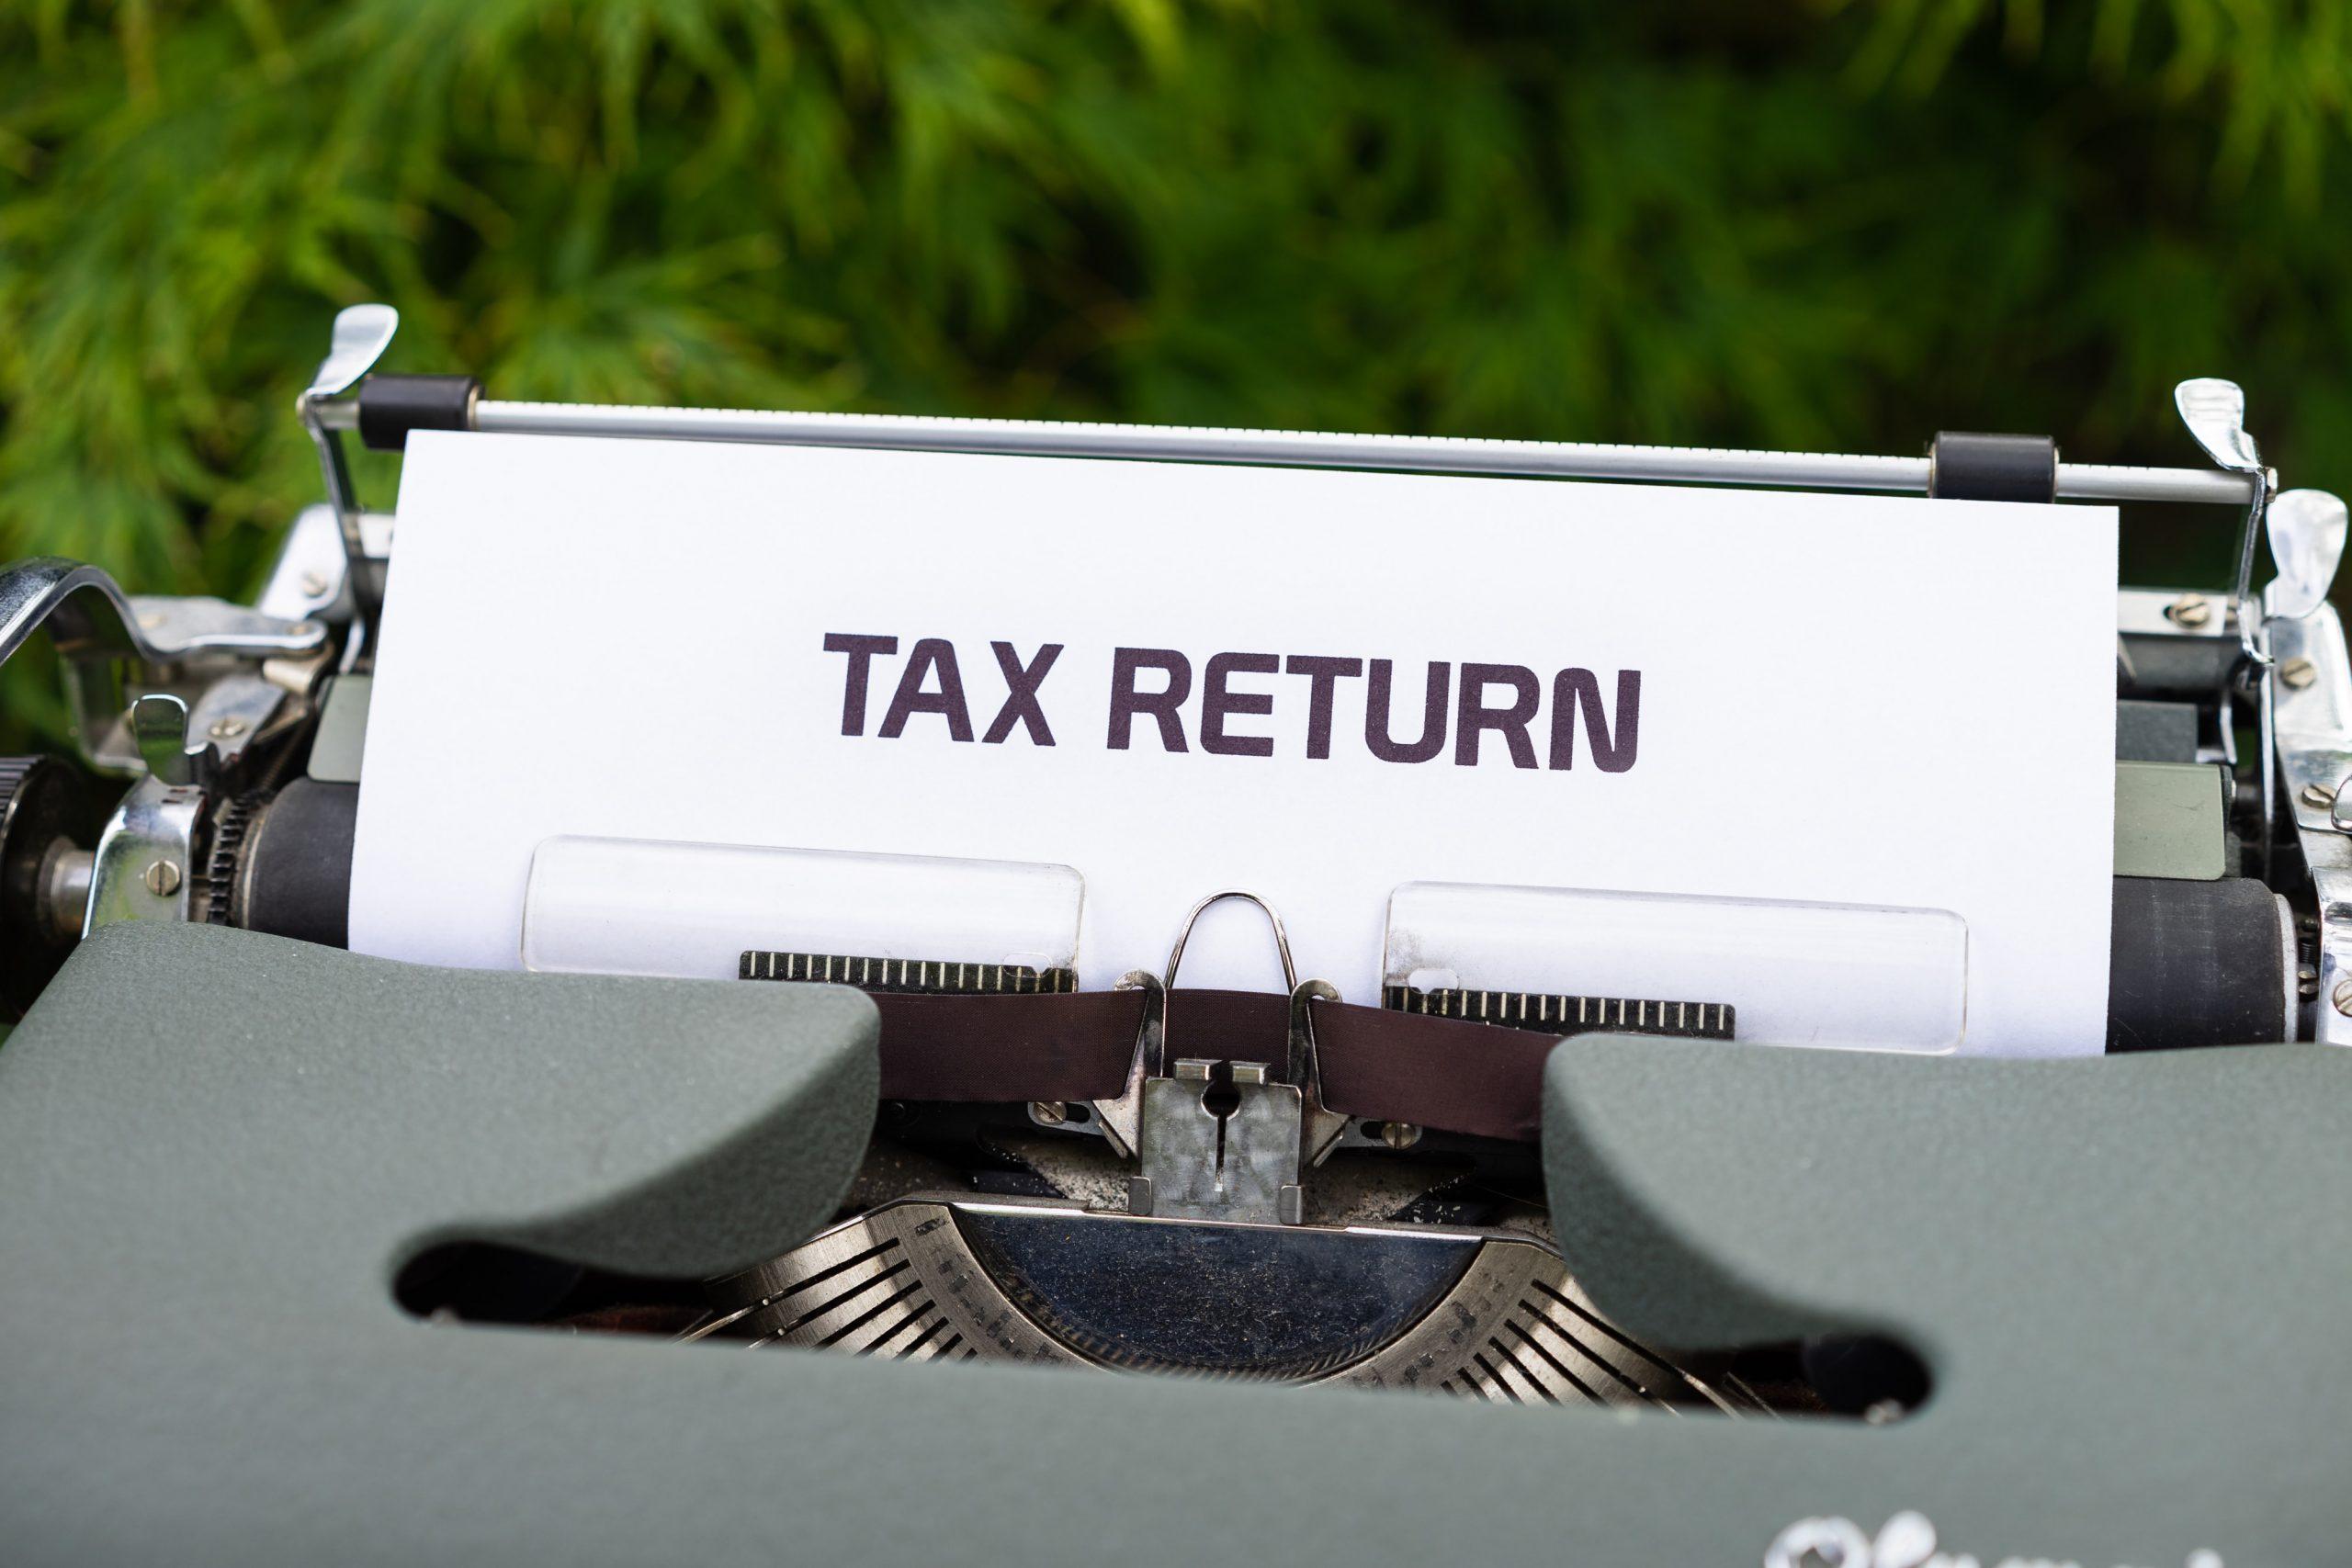 Tom Griffiths - US Expat Tax Return